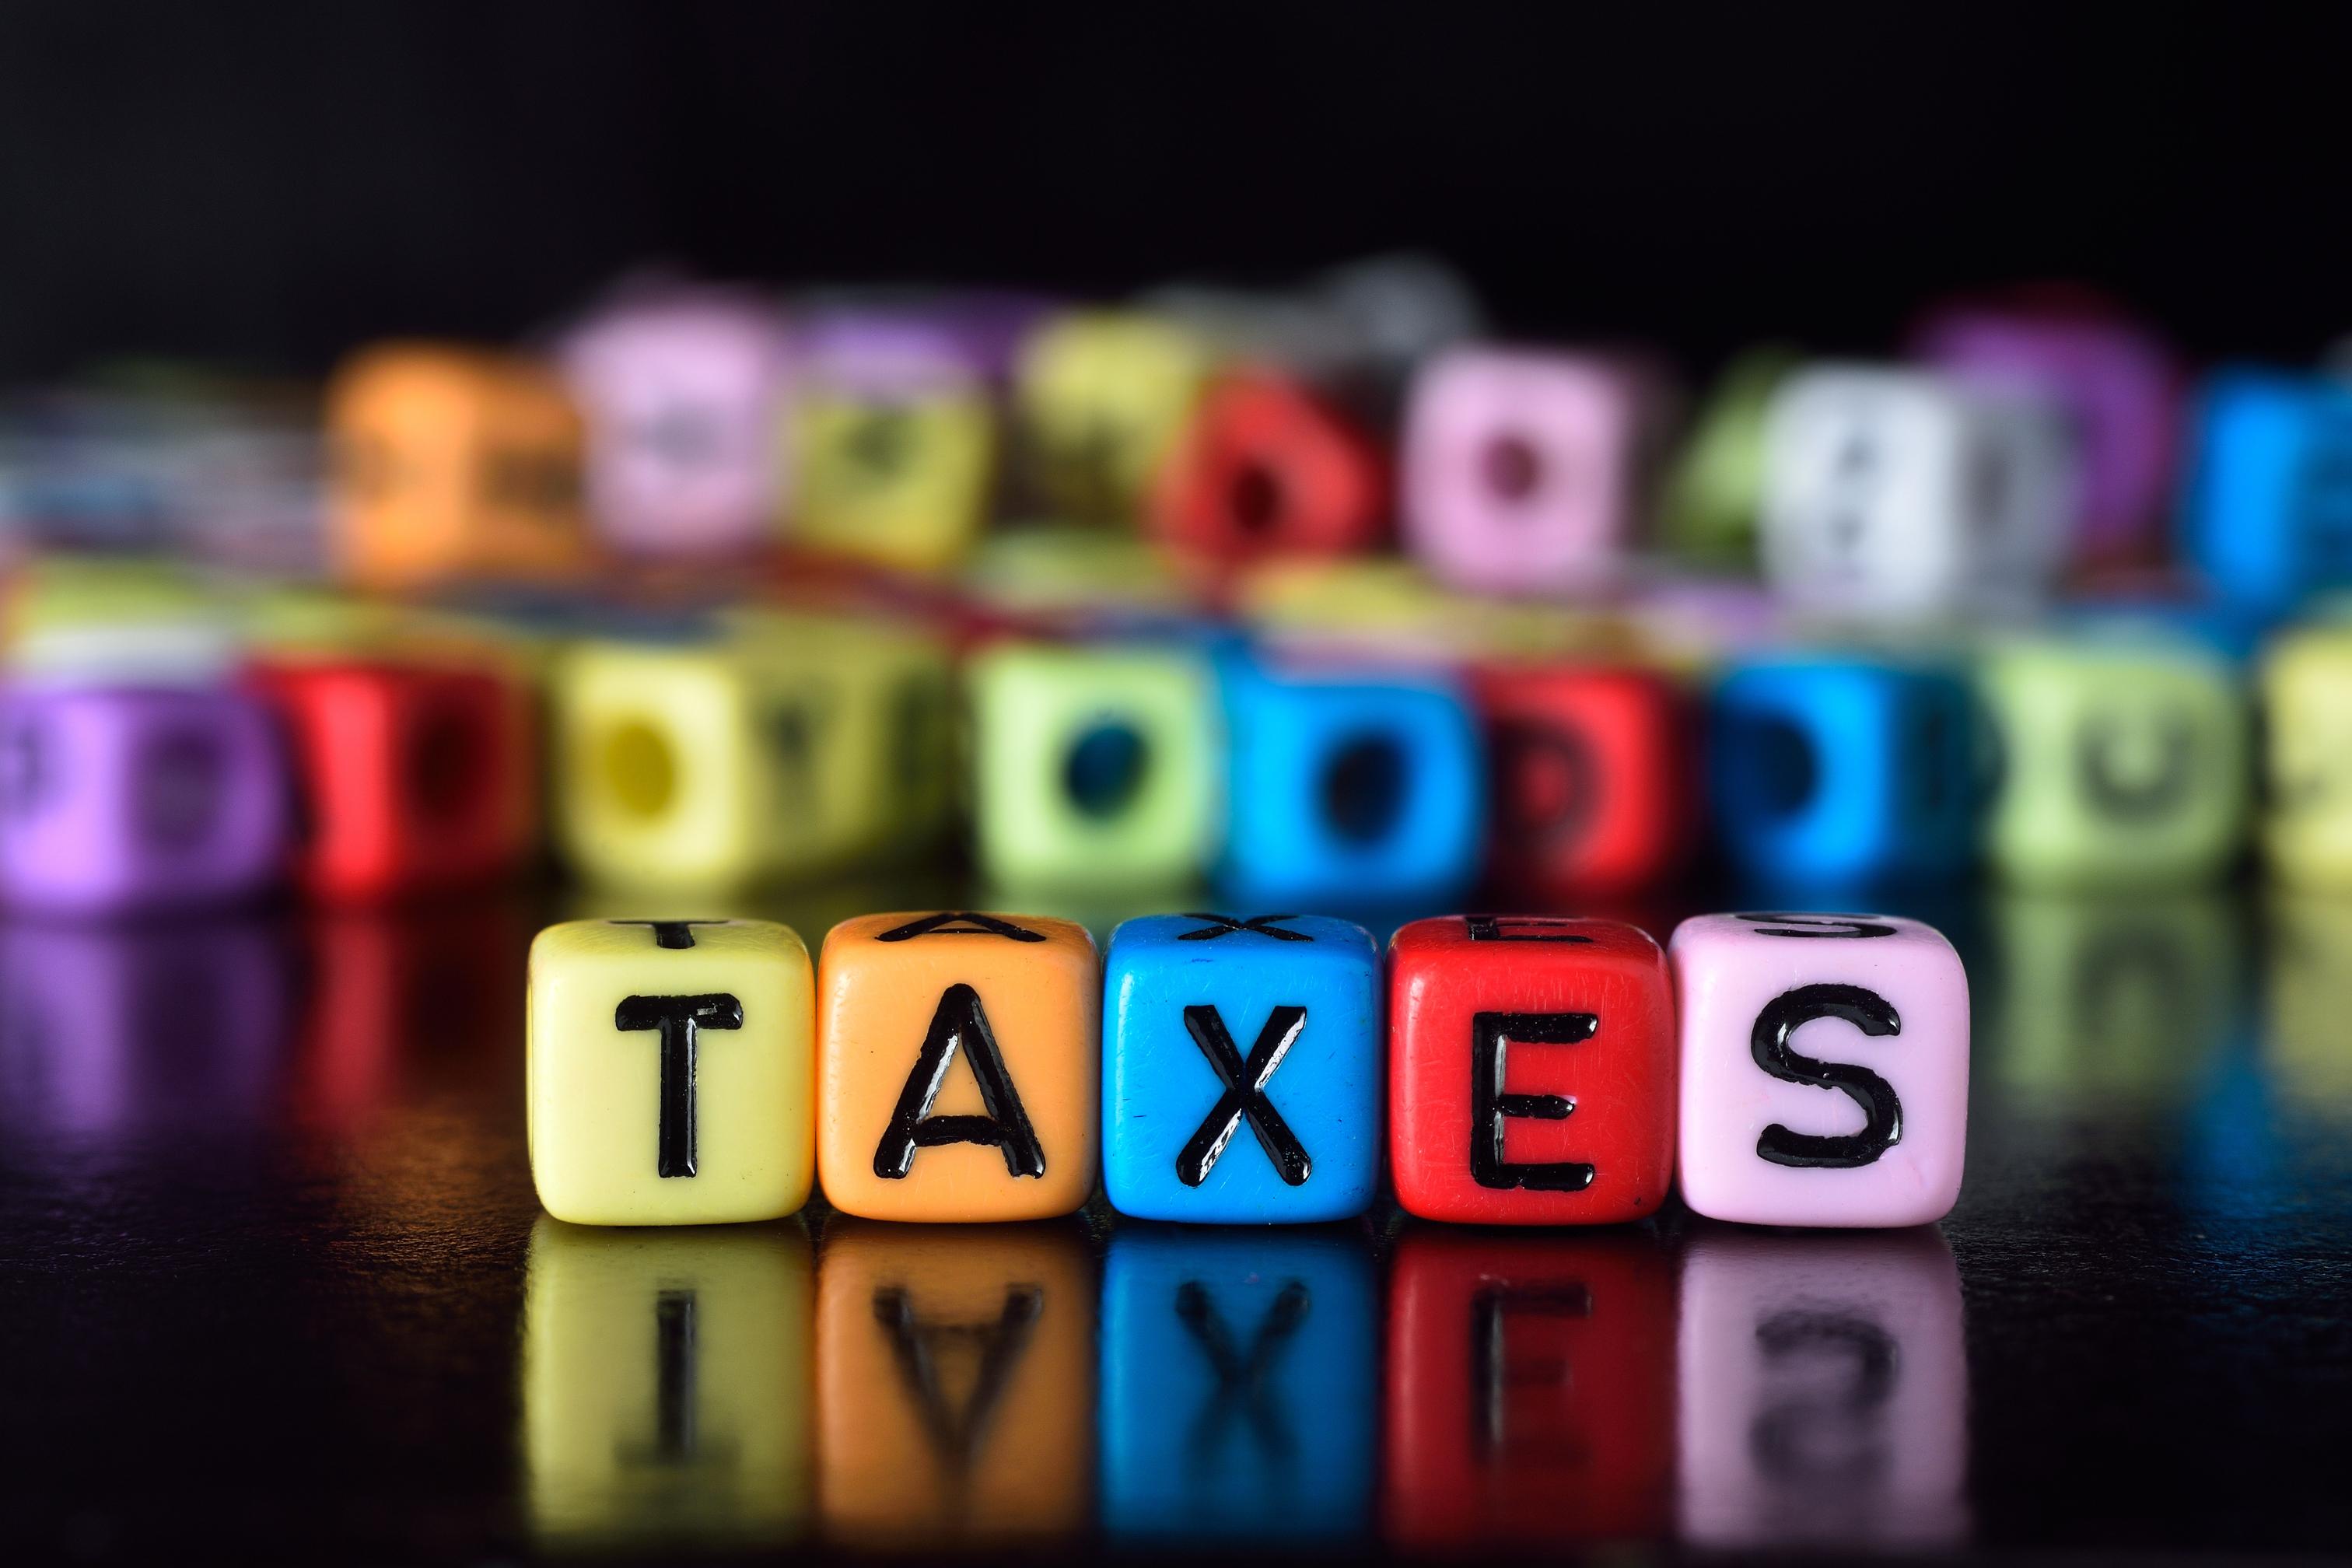 Taxes spelled in blocks